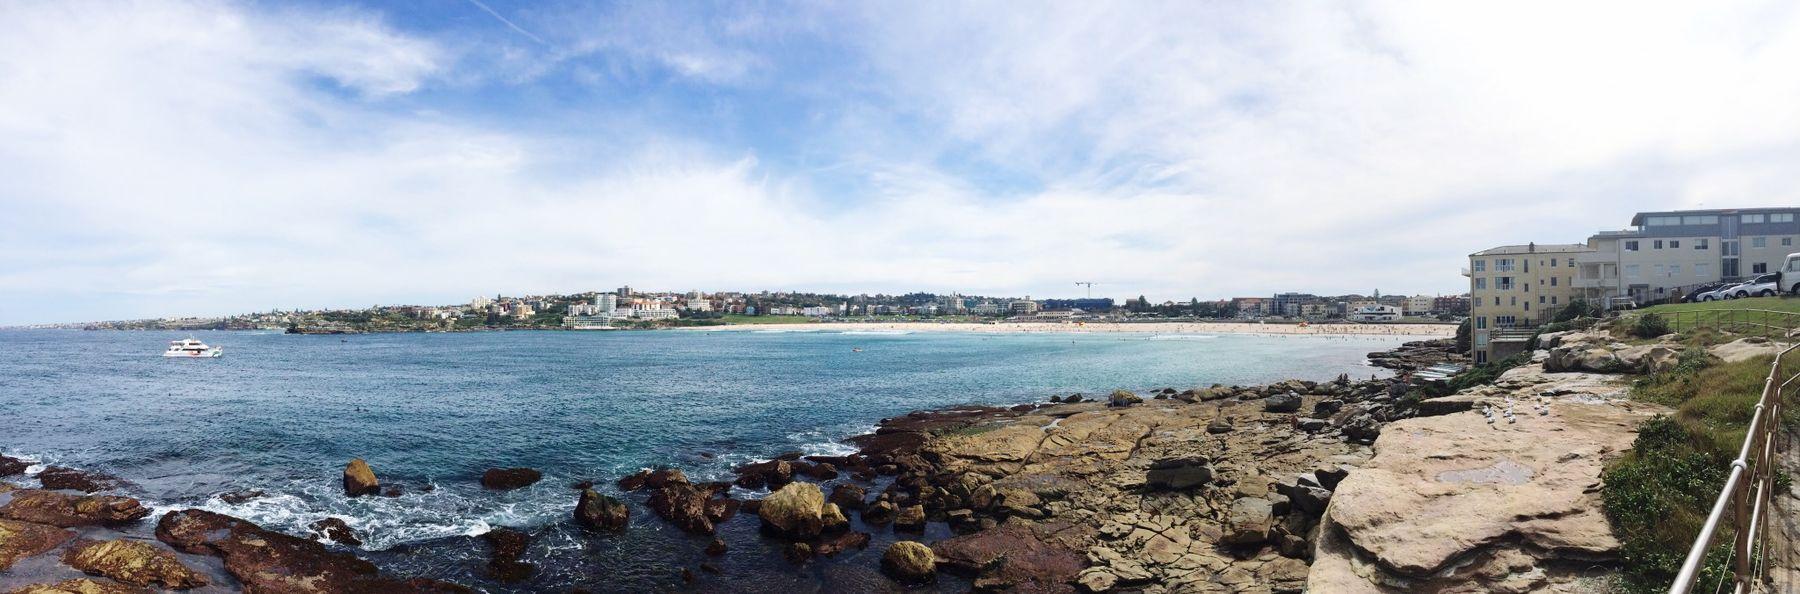 Bondi beach Bondi Beach Sunny☀ Blue Sky Hot